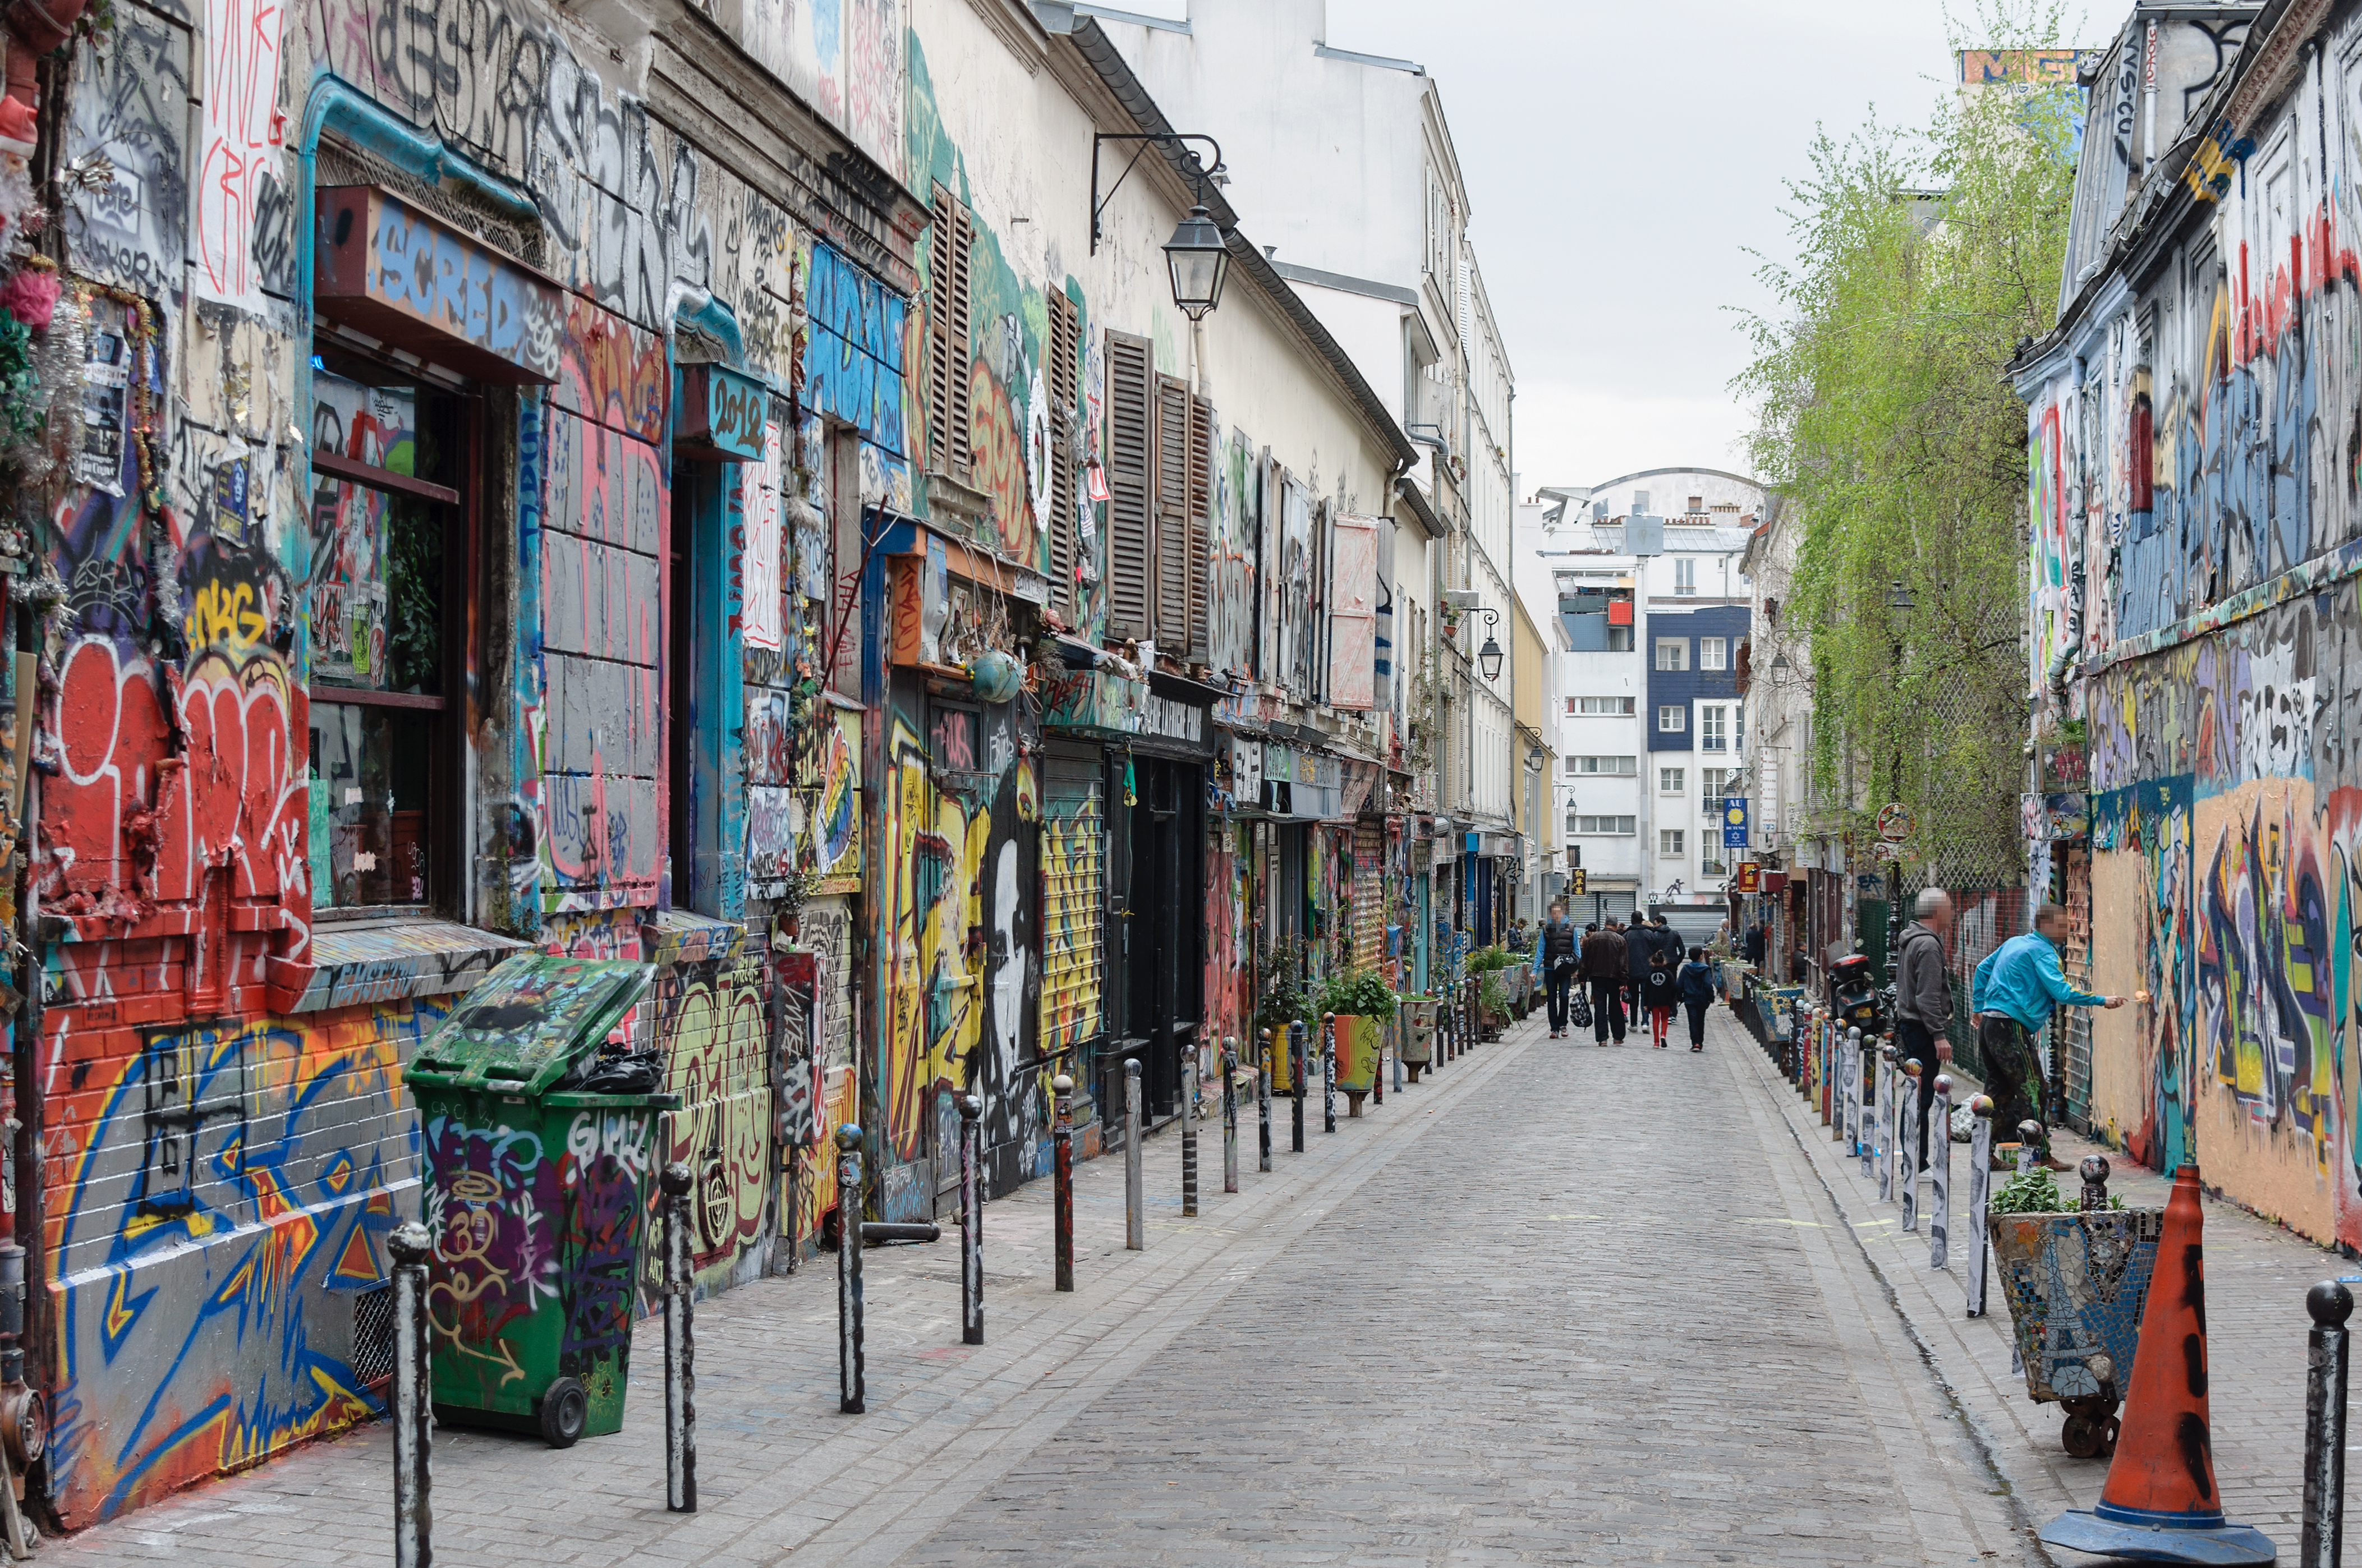 Angouleme (FR) prostitutes